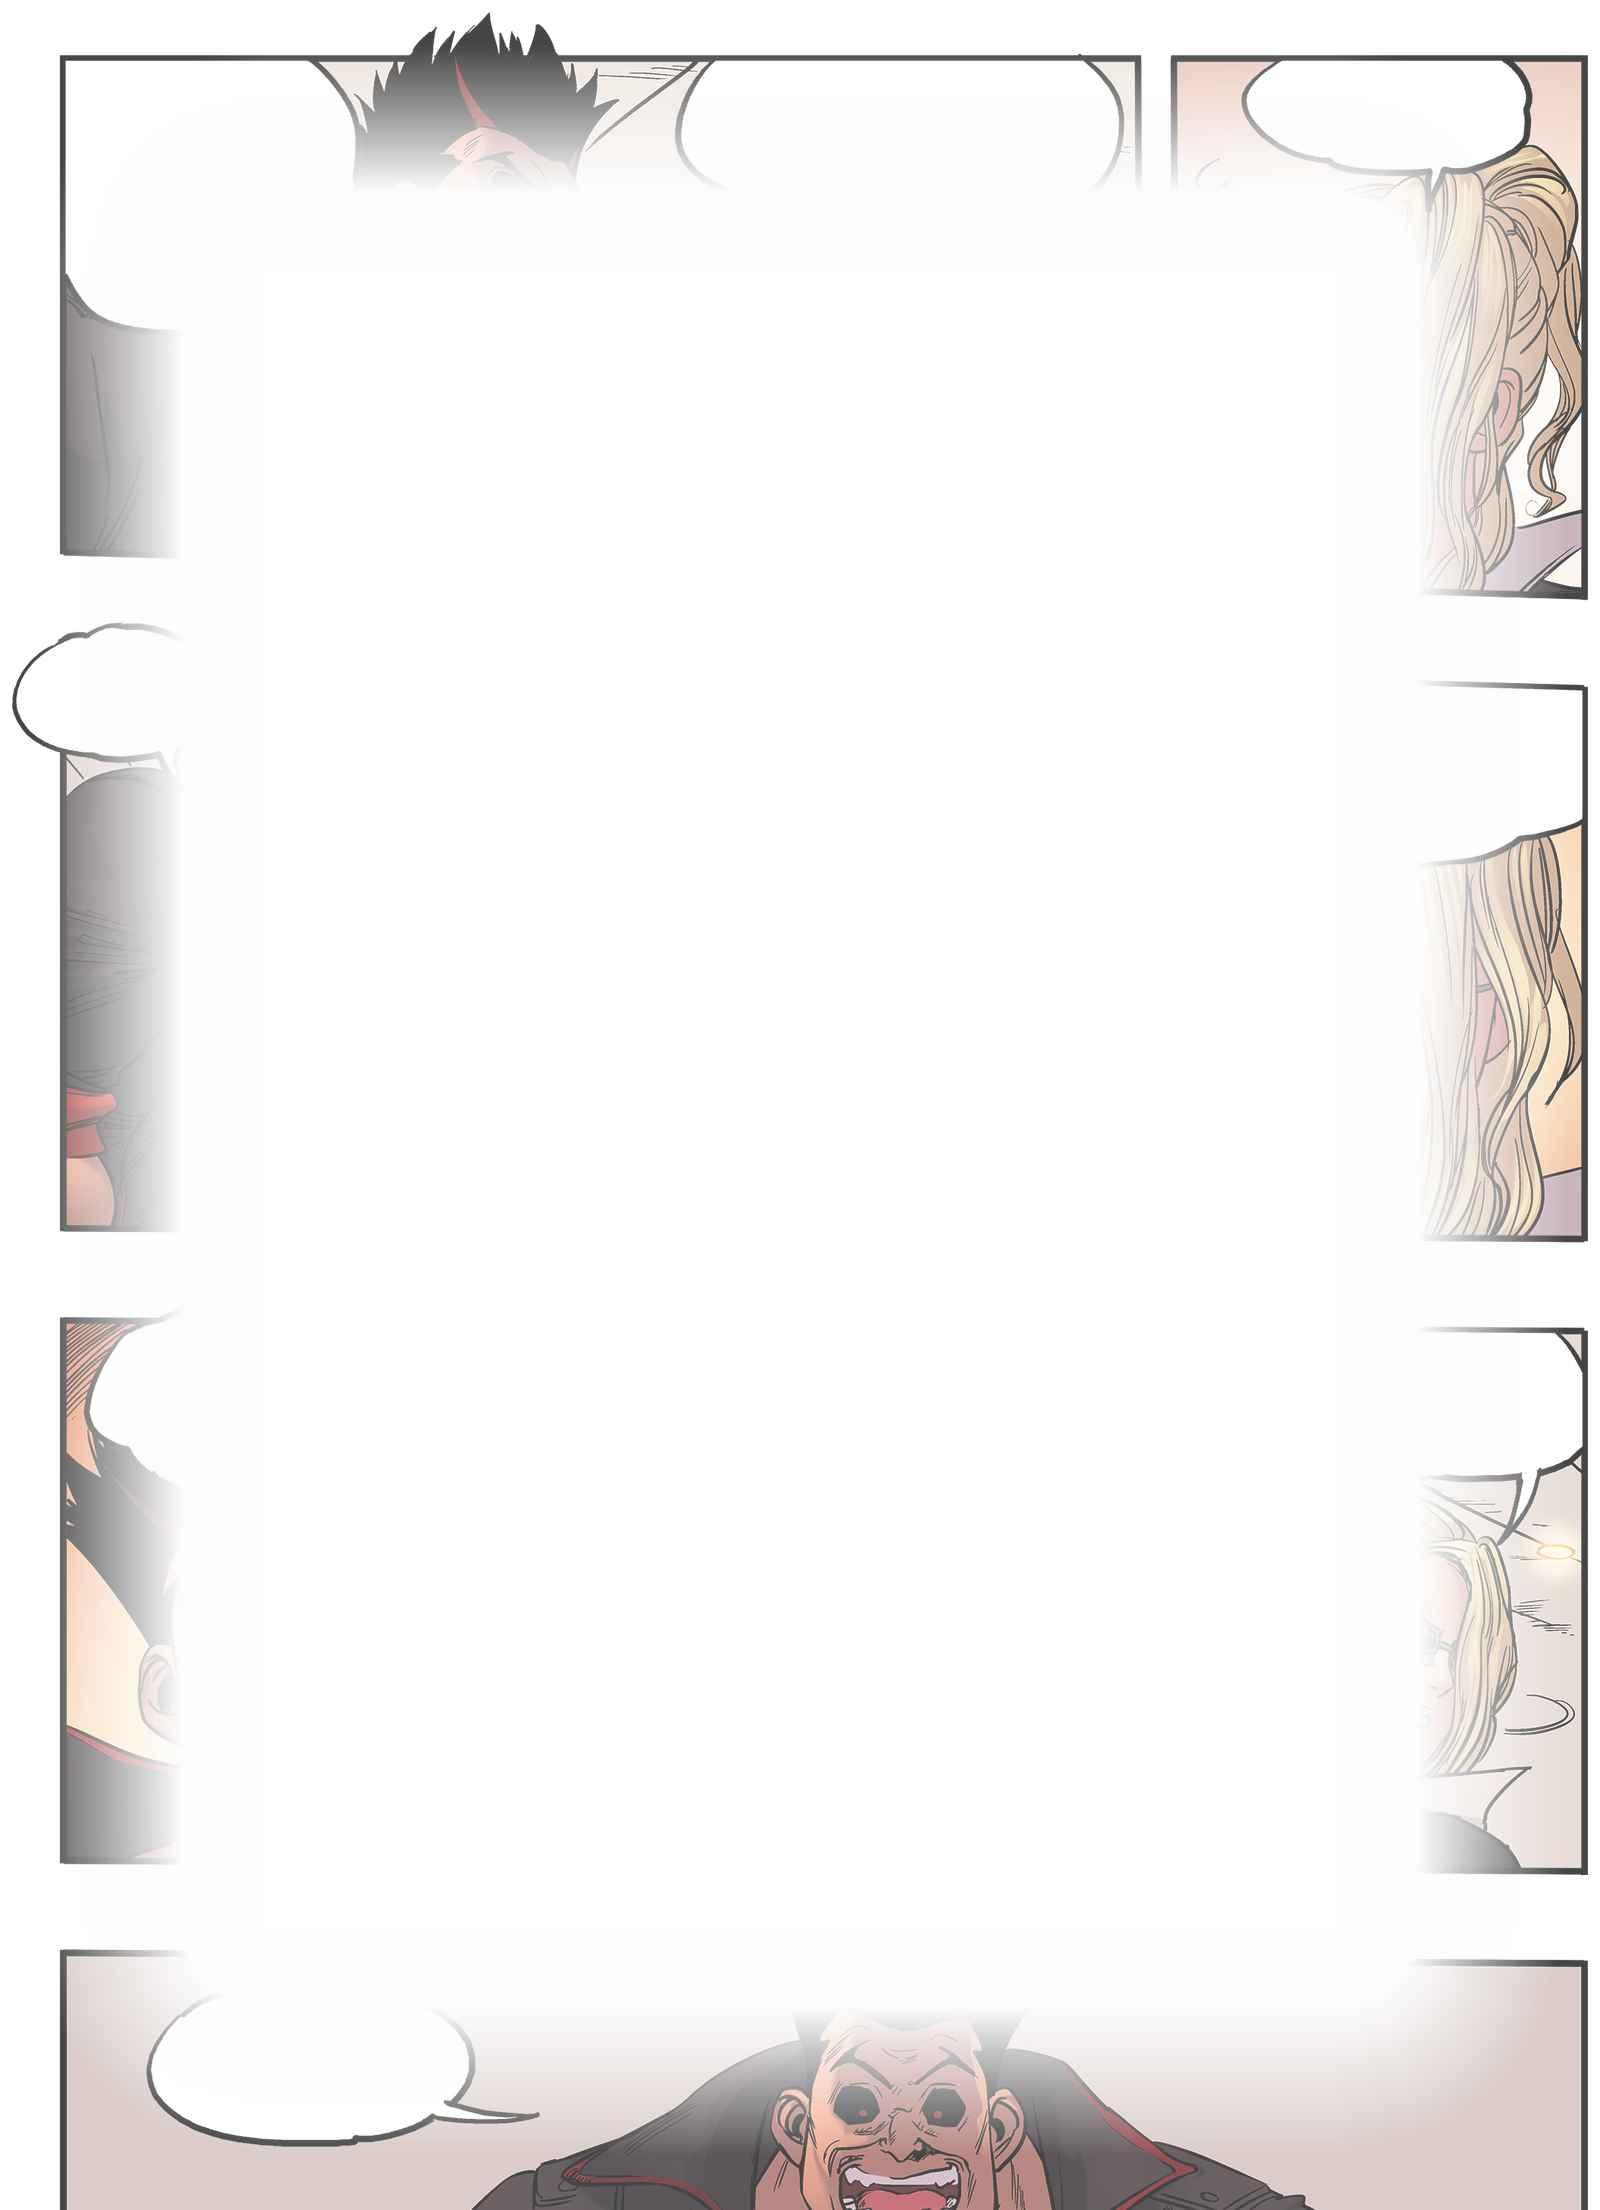 Amilova : Chapitre 7 page 17